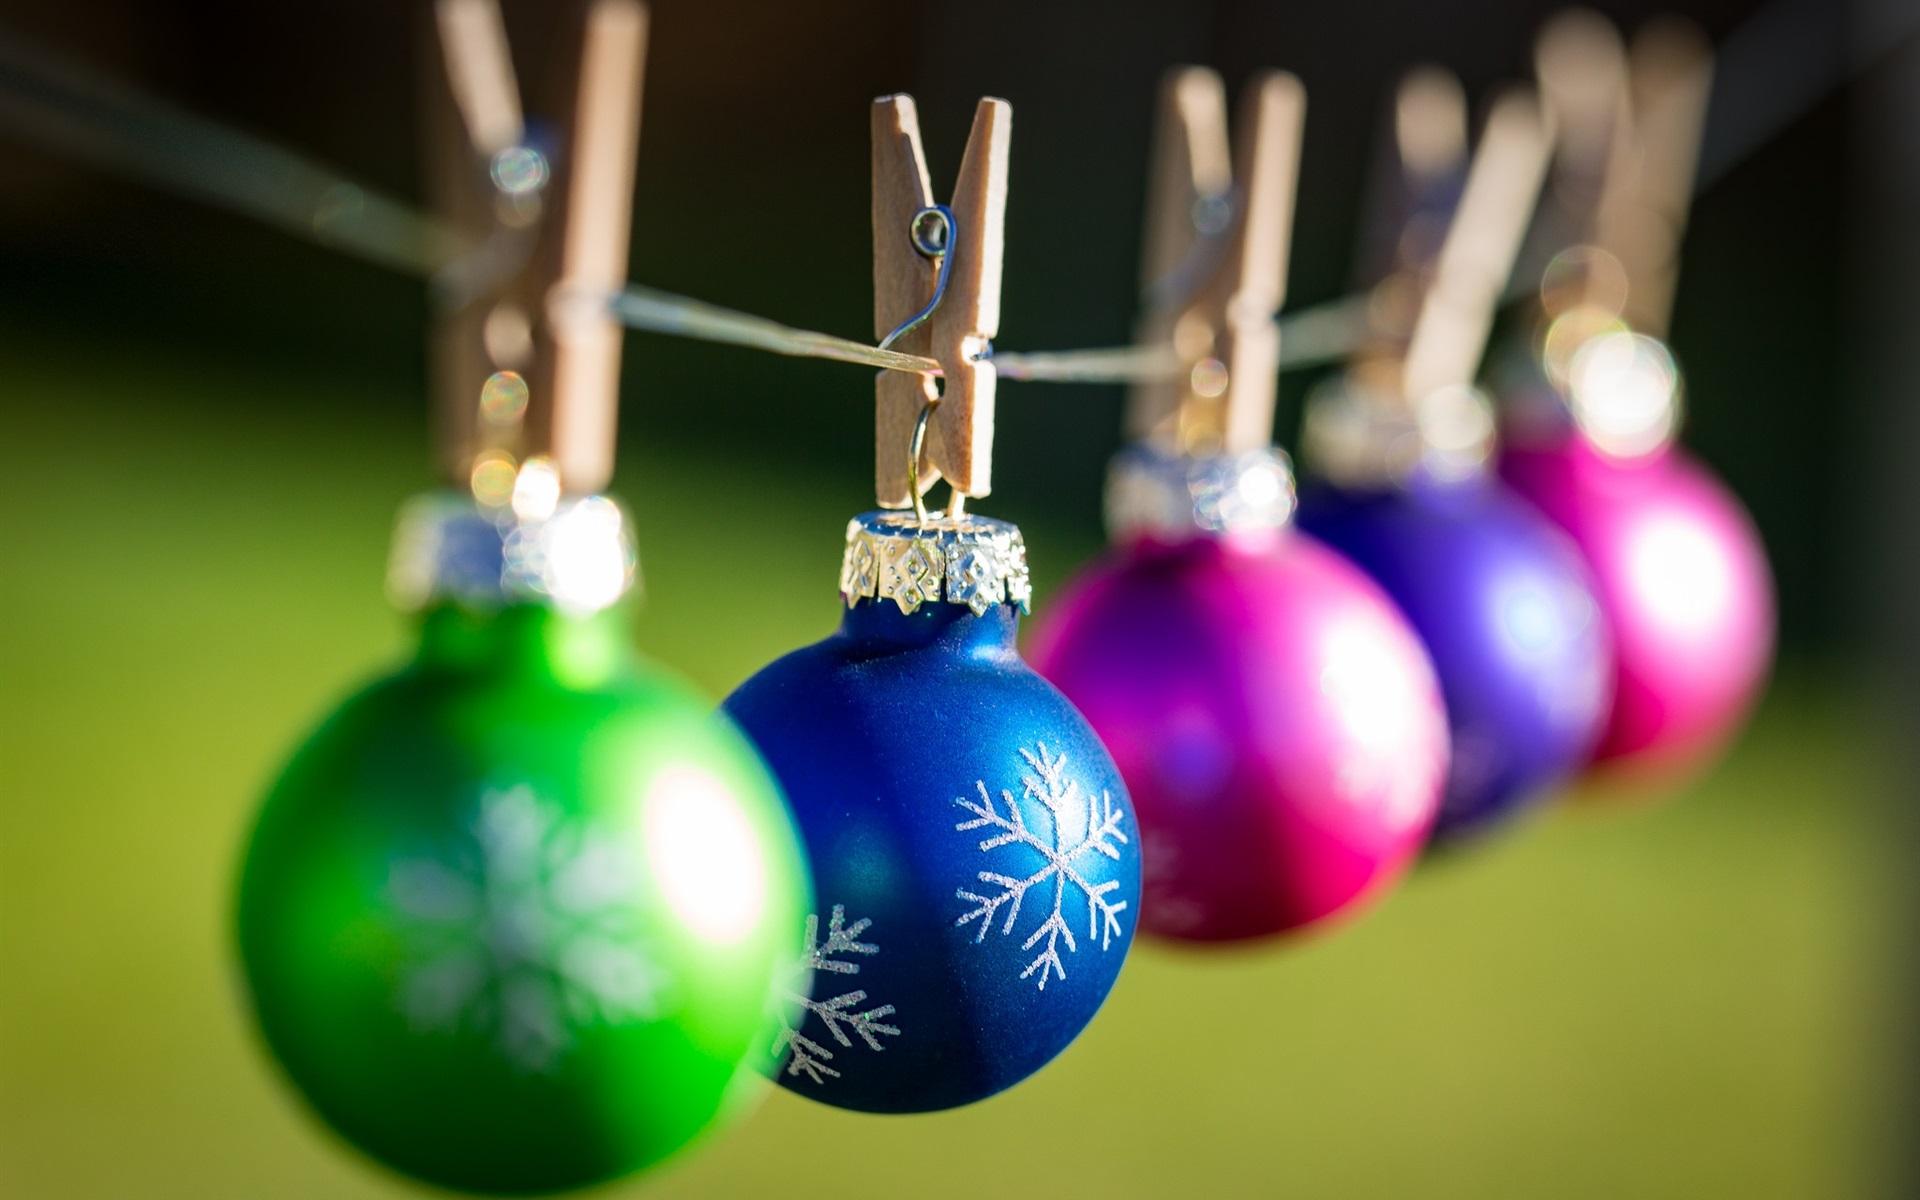 Wallpaper Colorful Christmas Balls Clothespins Bokeh